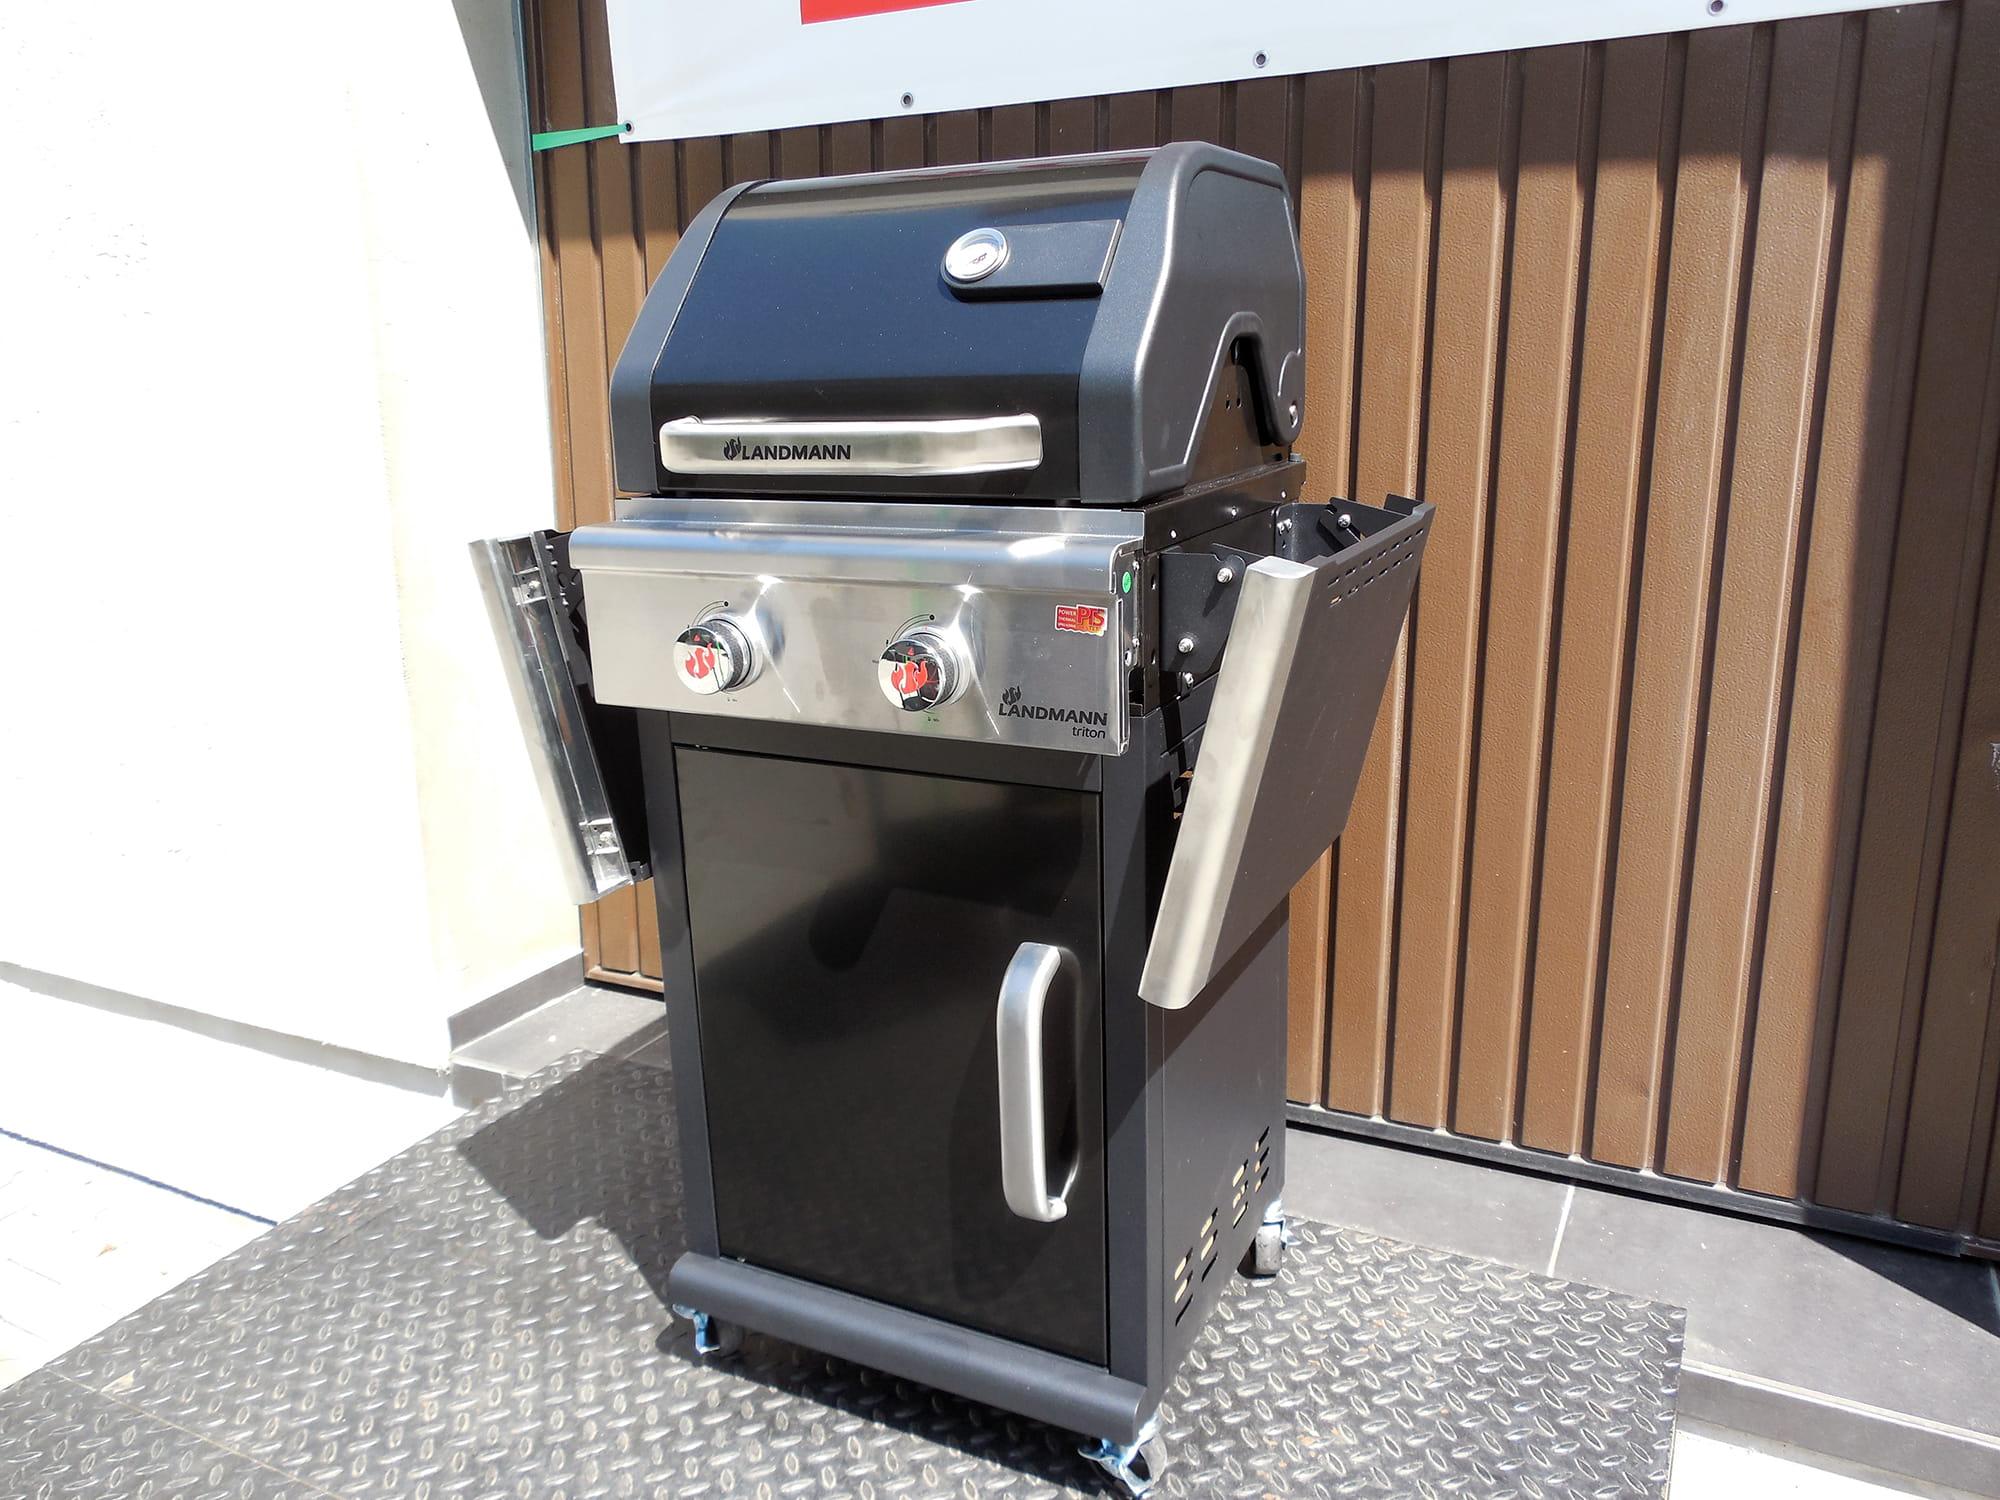 grill gazowy landmann triton pts 2 0 czarny 12903 sklep z grillami grille. Black Bedroom Furniture Sets. Home Design Ideas